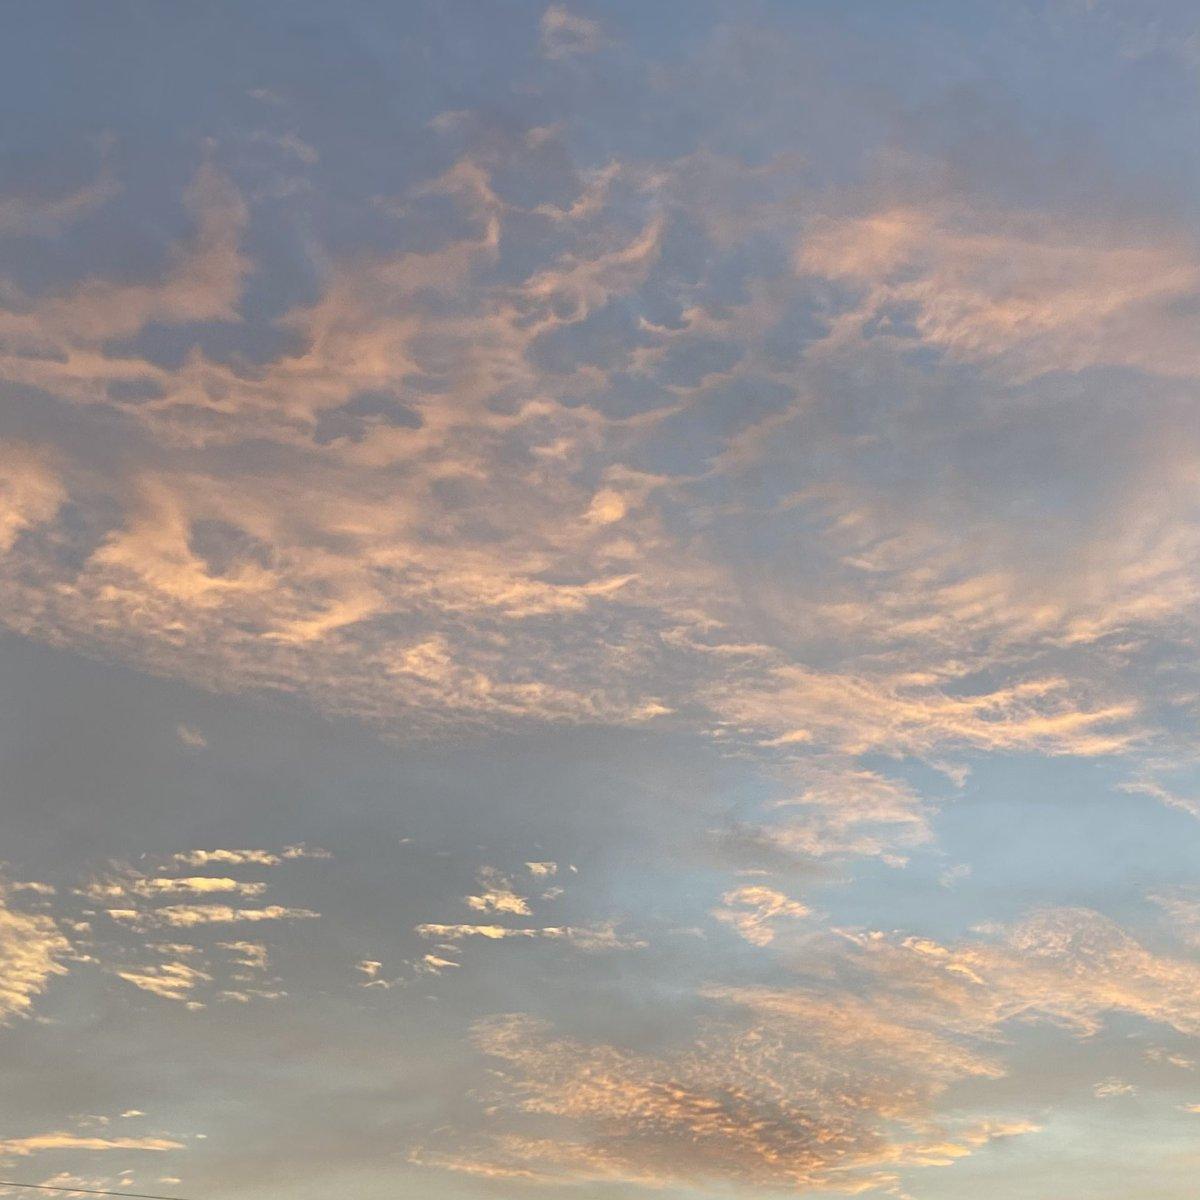 Good morning ka #skyphotography https://t.co/Fh09hIwKx5